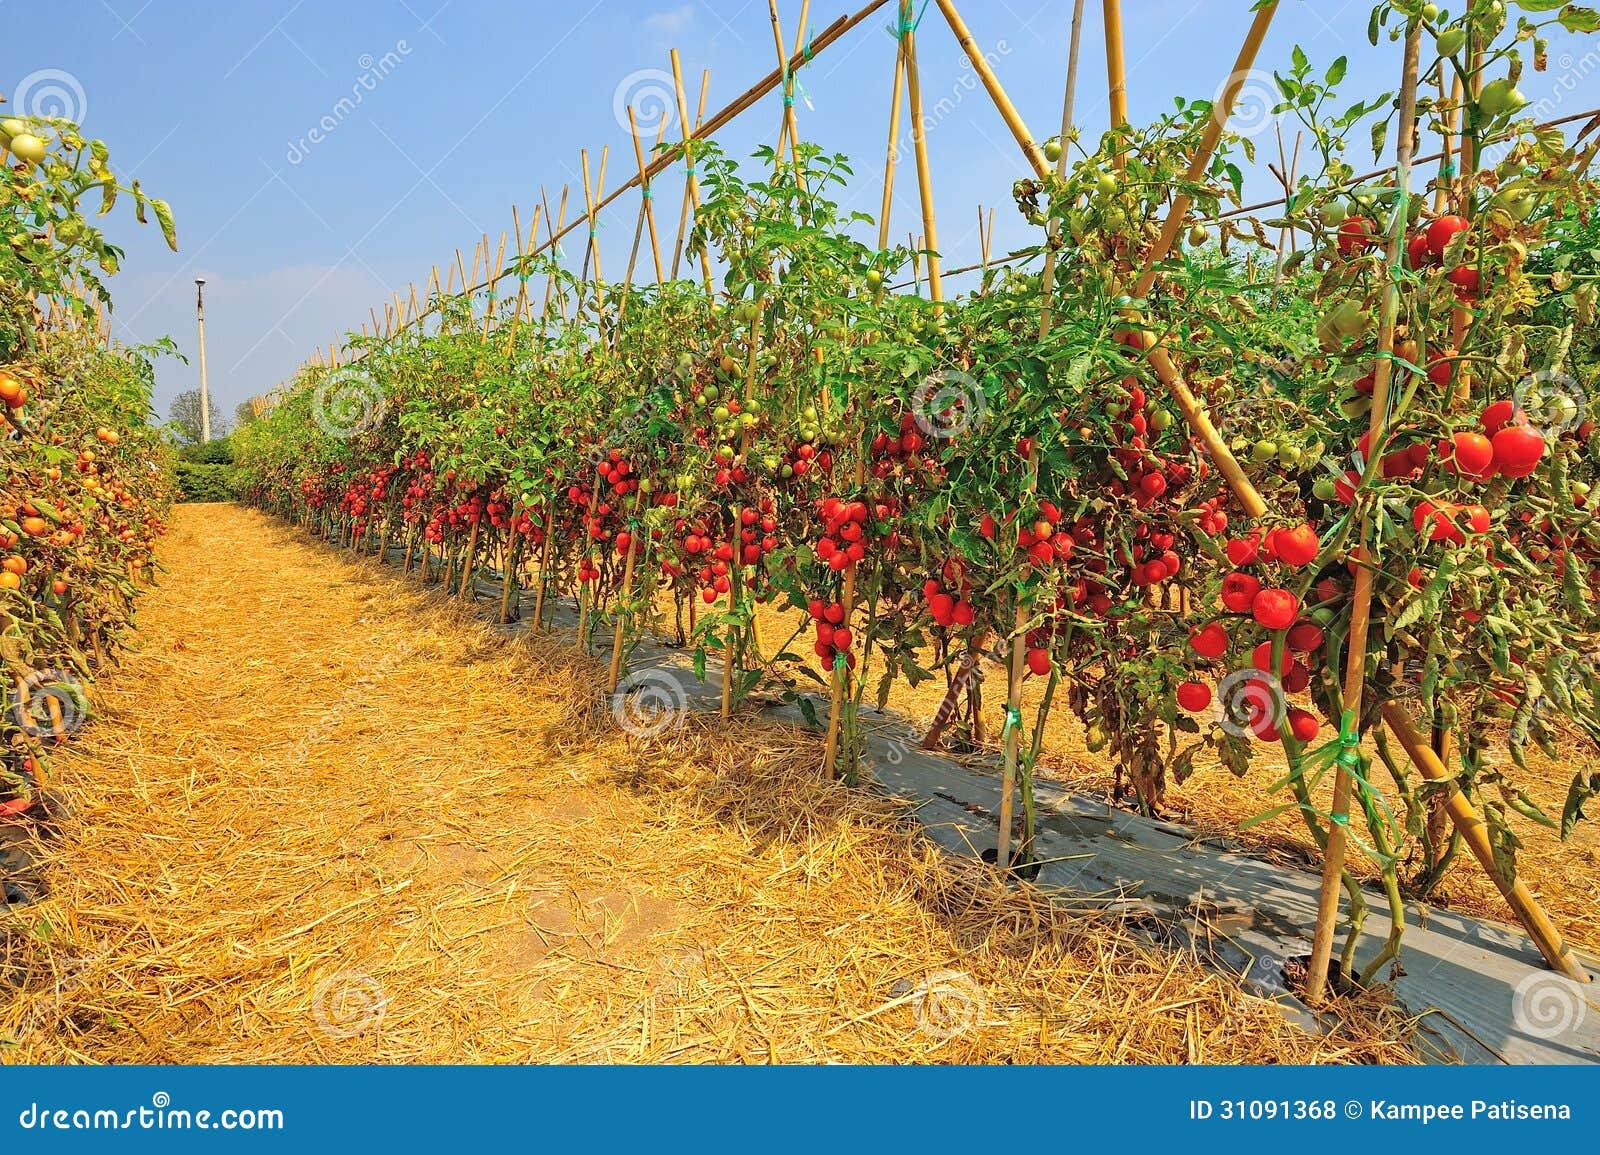 plantation with fresh tomato stock photo image of leaf grow 31091368. Black Bedroom Furniture Sets. Home Design Ideas